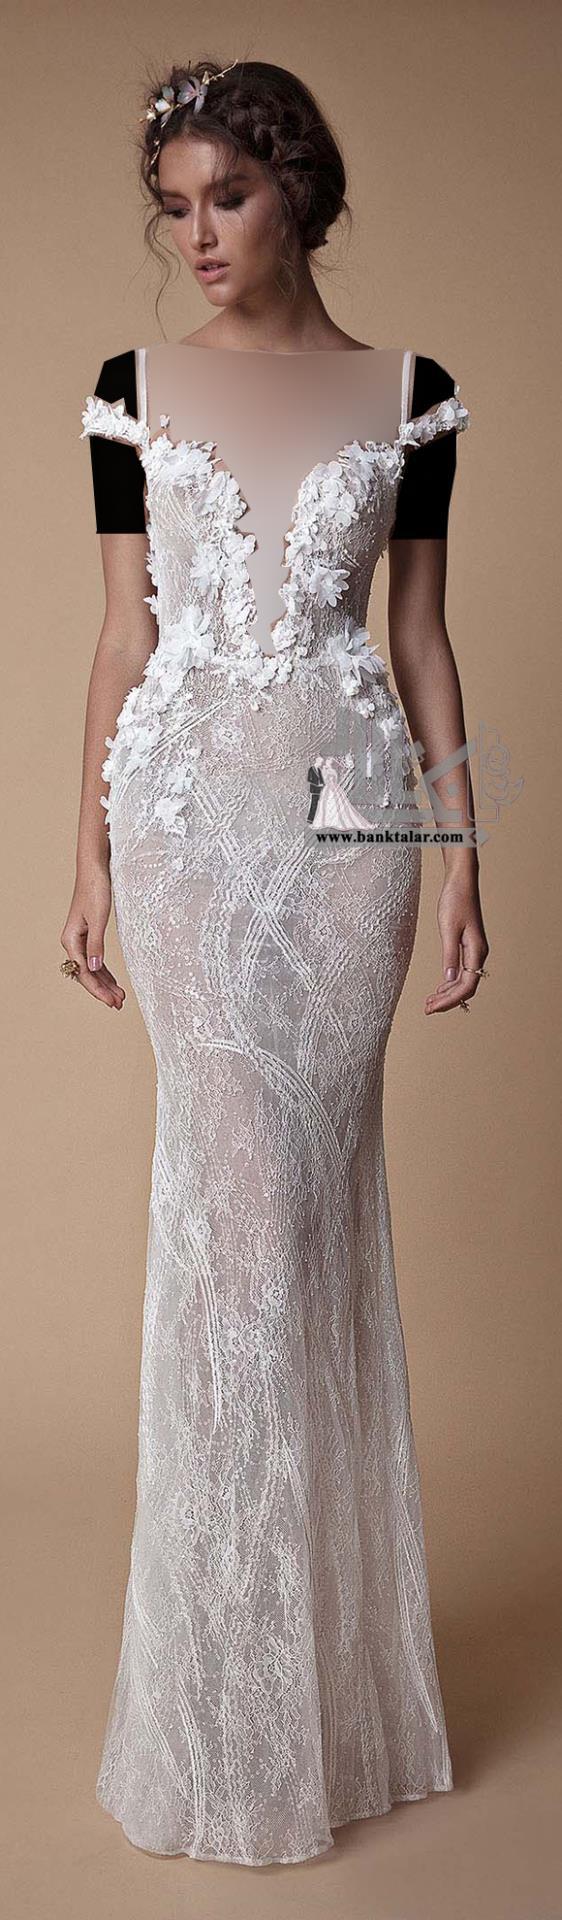 لباس عروس ۲۰۱۸ کالکشن زمستان و بهار